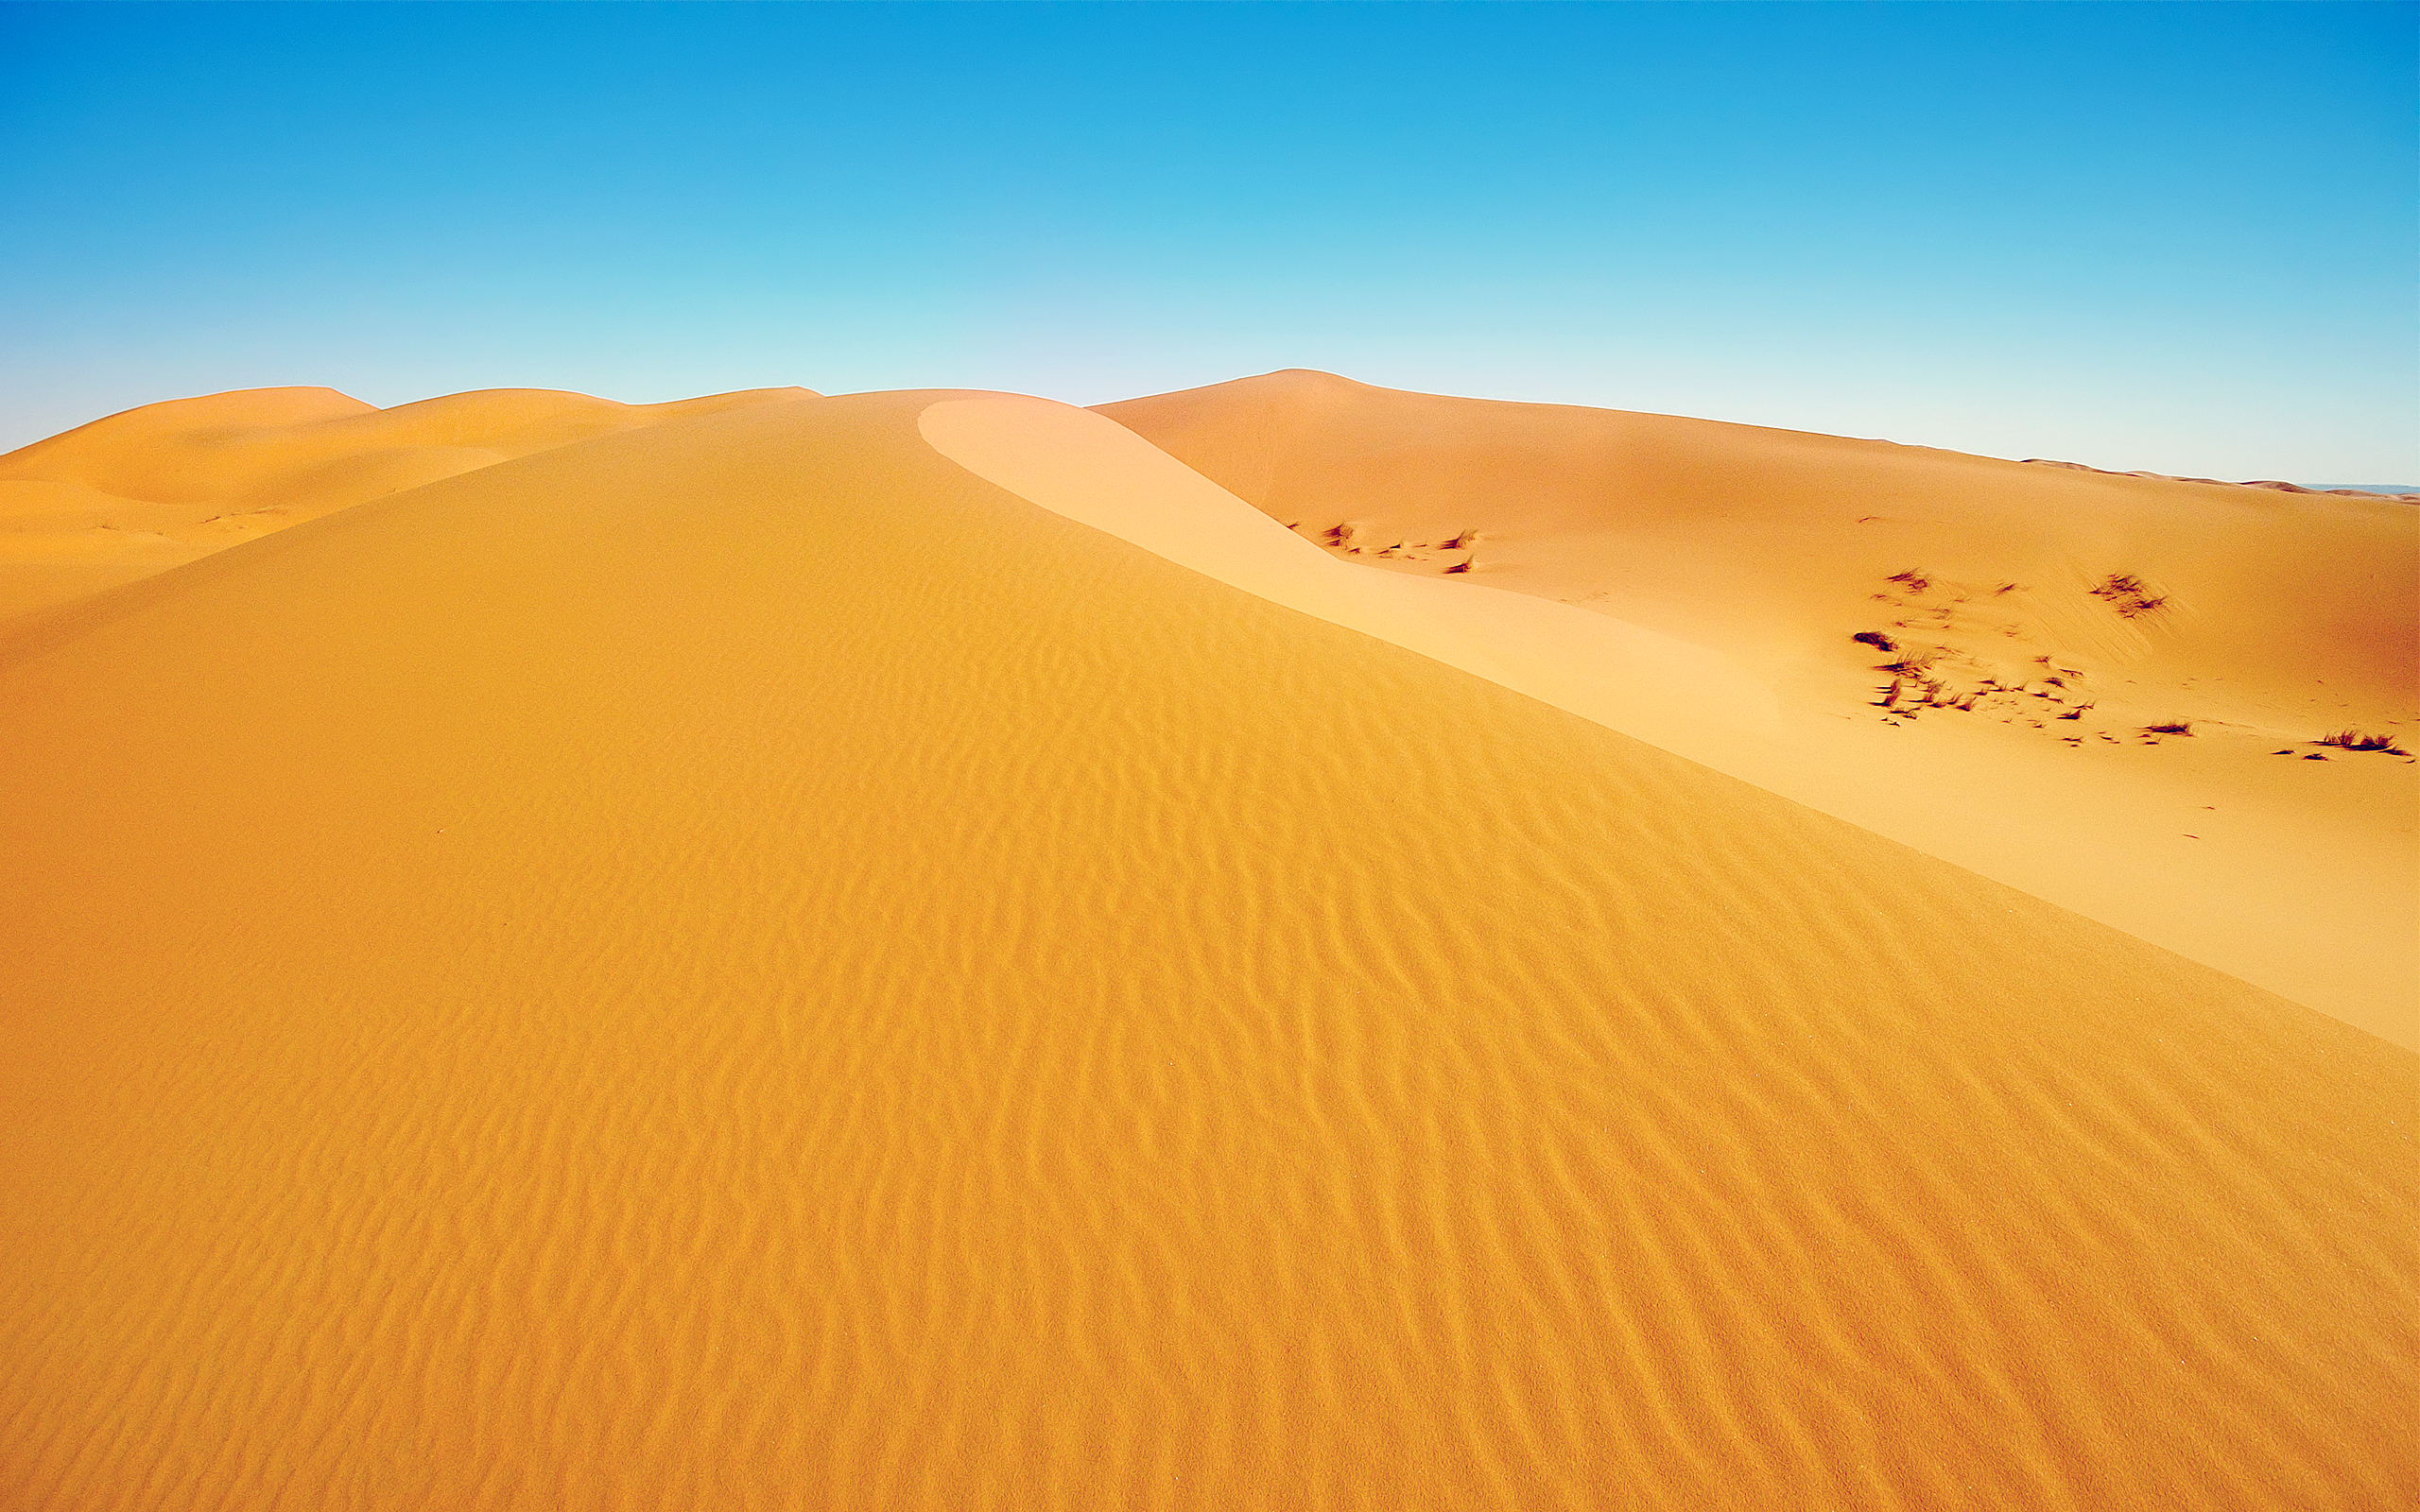 African Desert Wallpapers HD Wallpapers 2560x1600